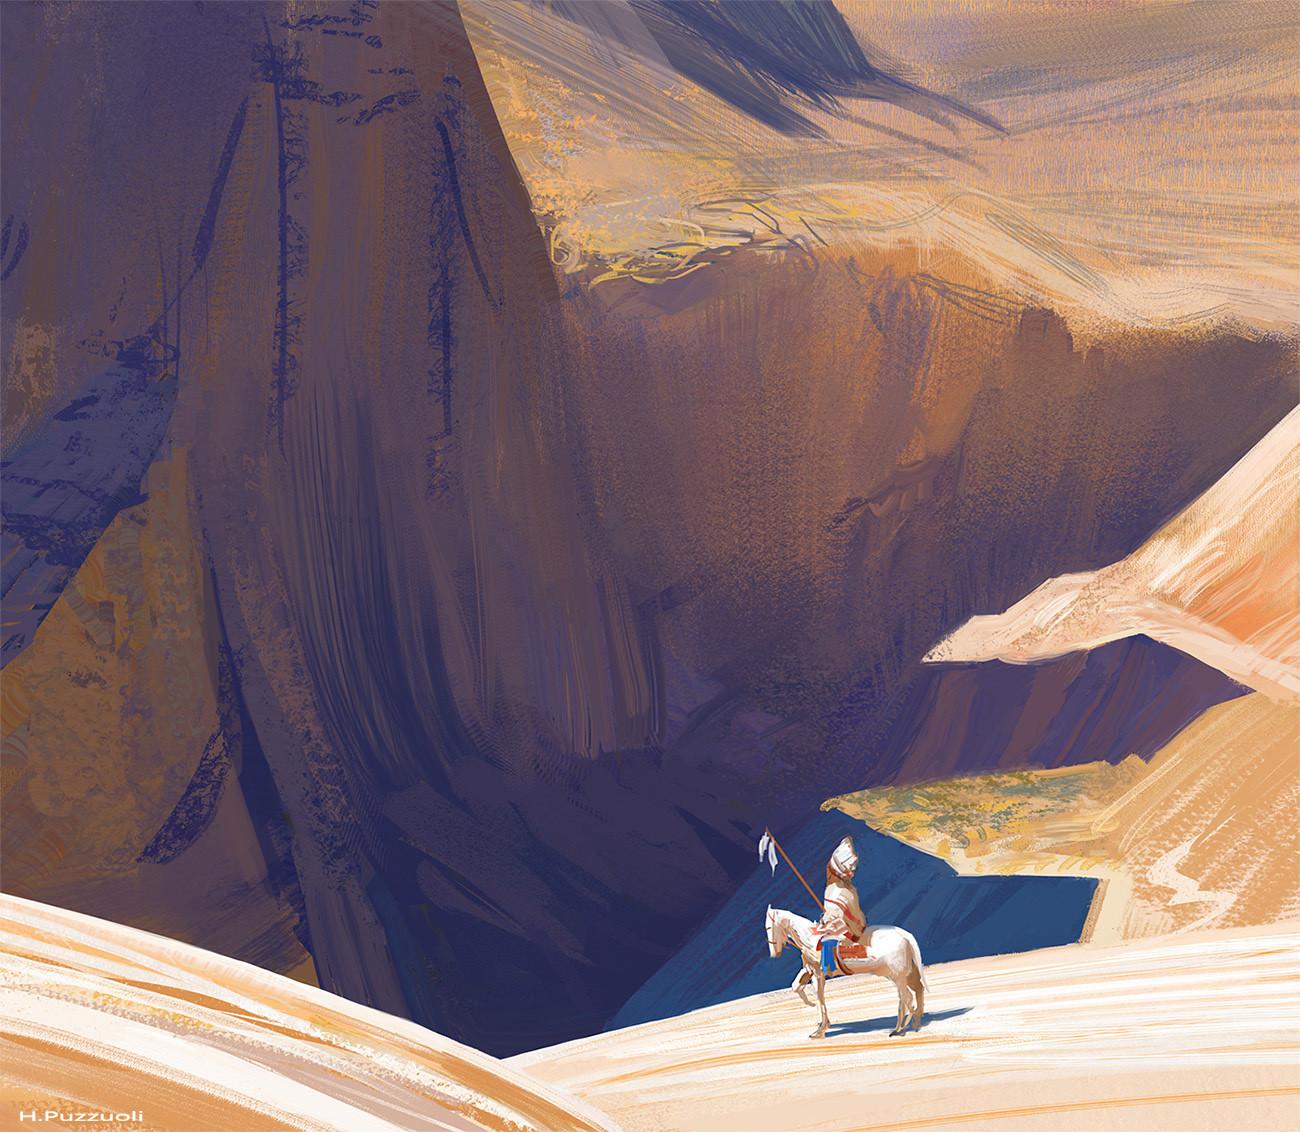 Hugo puzzuoli canyon indian02